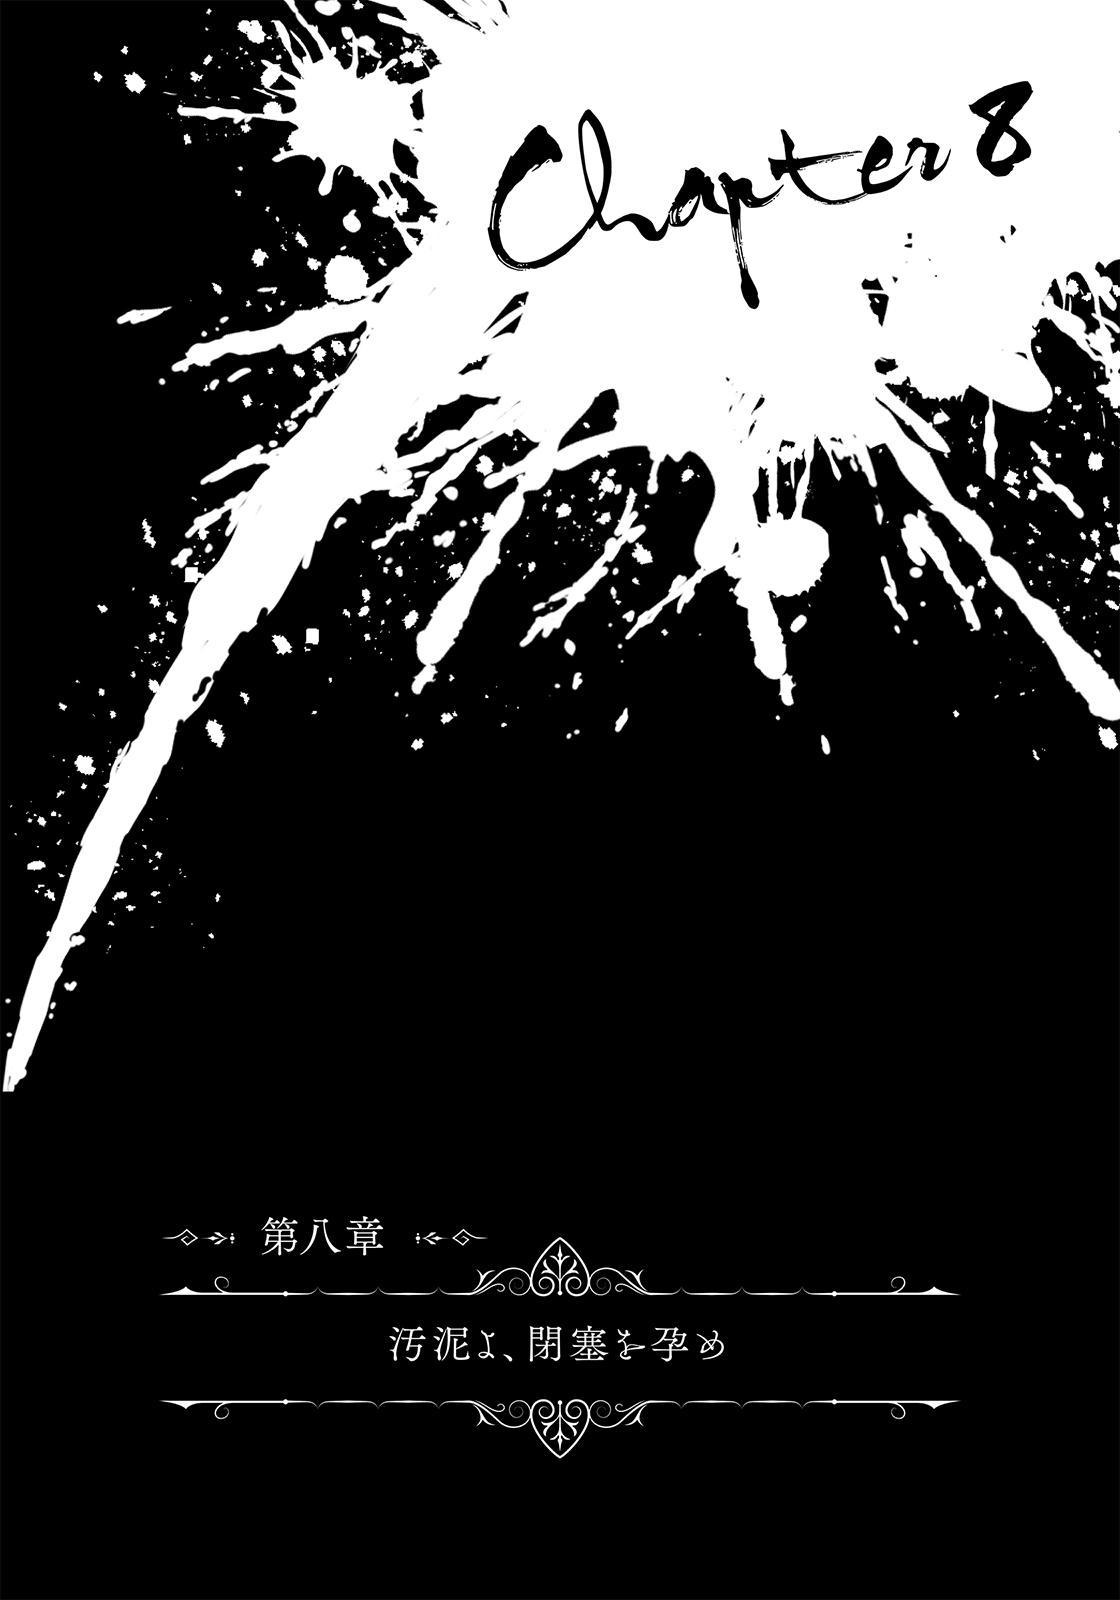 Elvenblood - Vol 2 Chapter 8